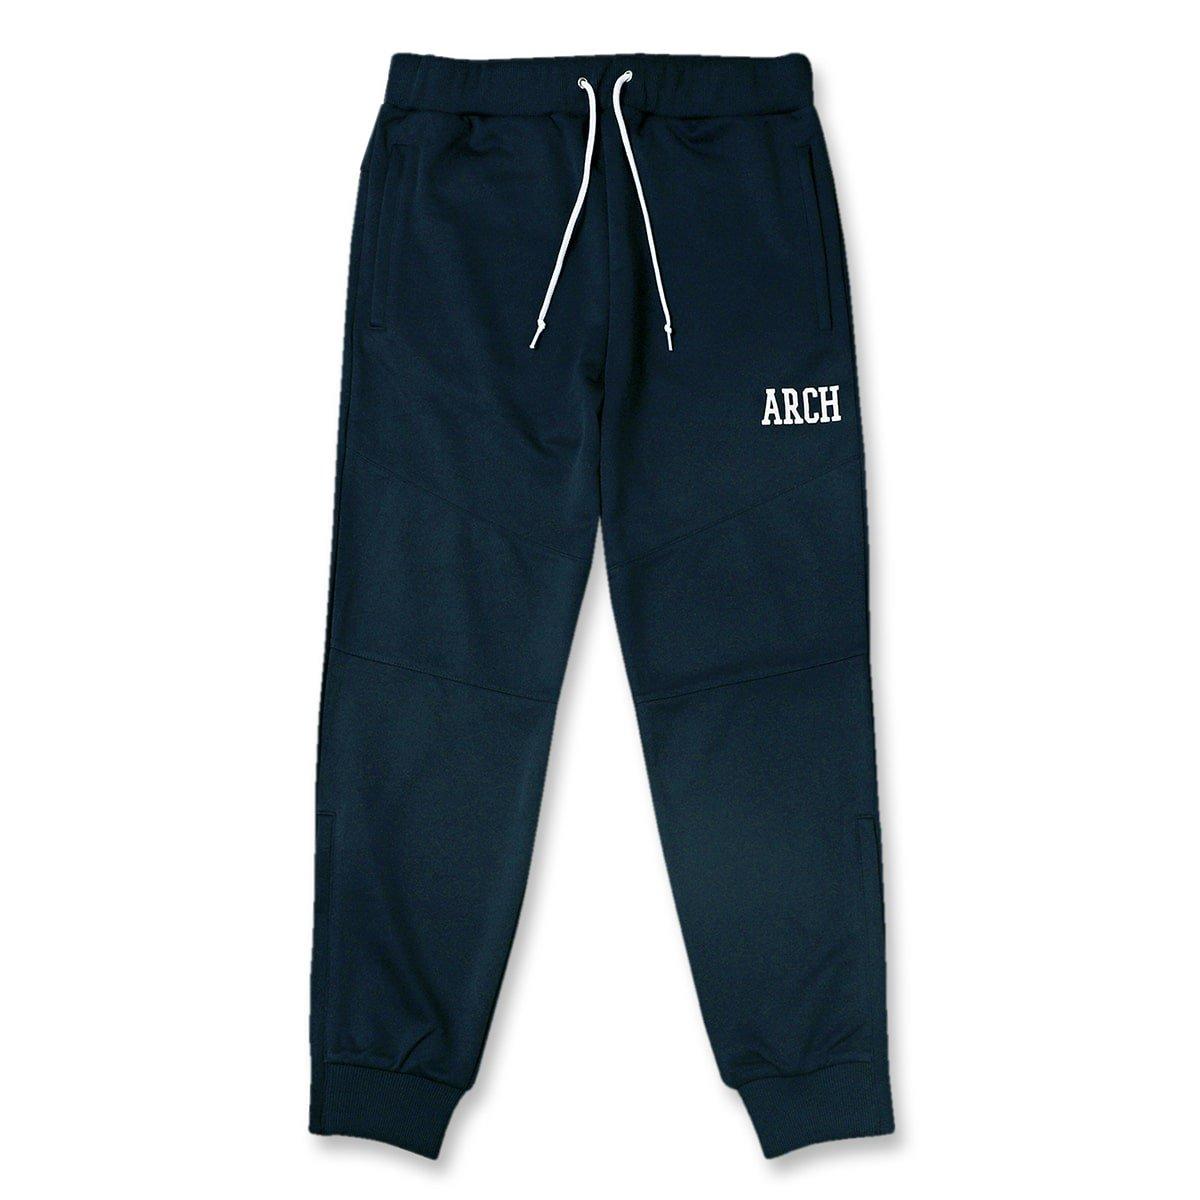 jersey jogger pants【navy】